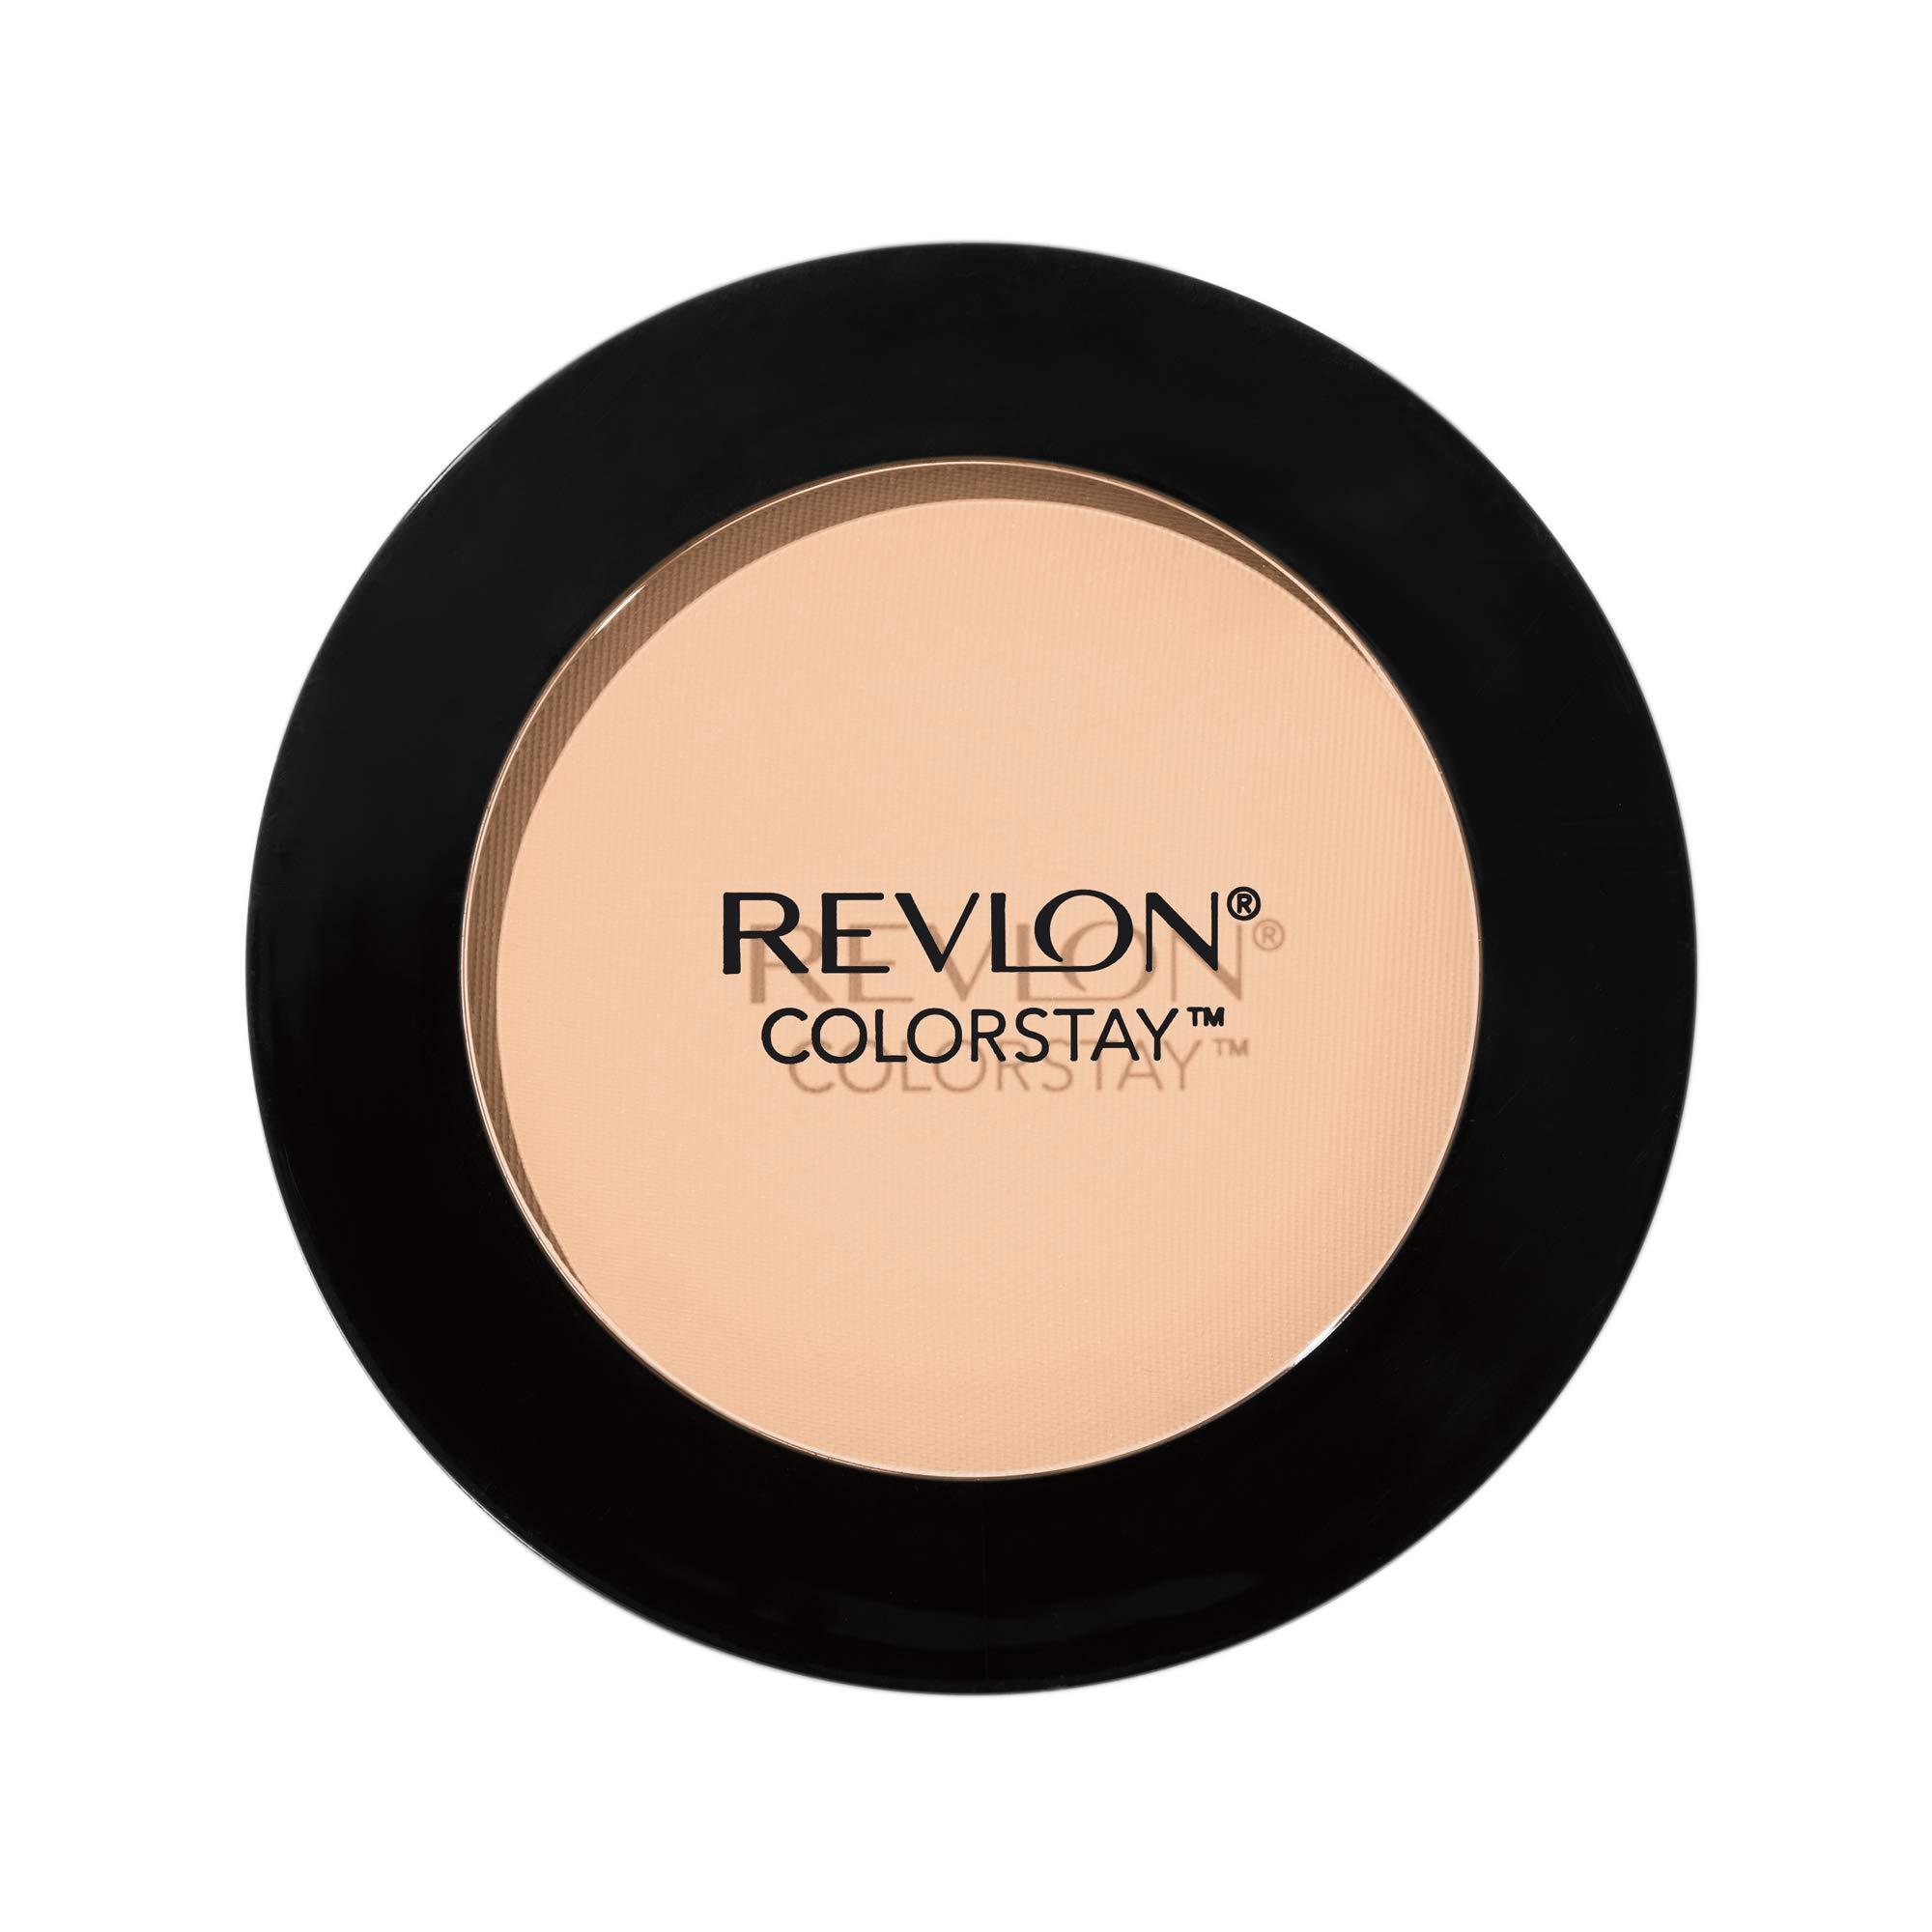 Revlon ColorStay Pressed Powder, Longwearing Oil Free, Fragrance Free, Noncomedogenic, 100 Banana, 0.30 oz